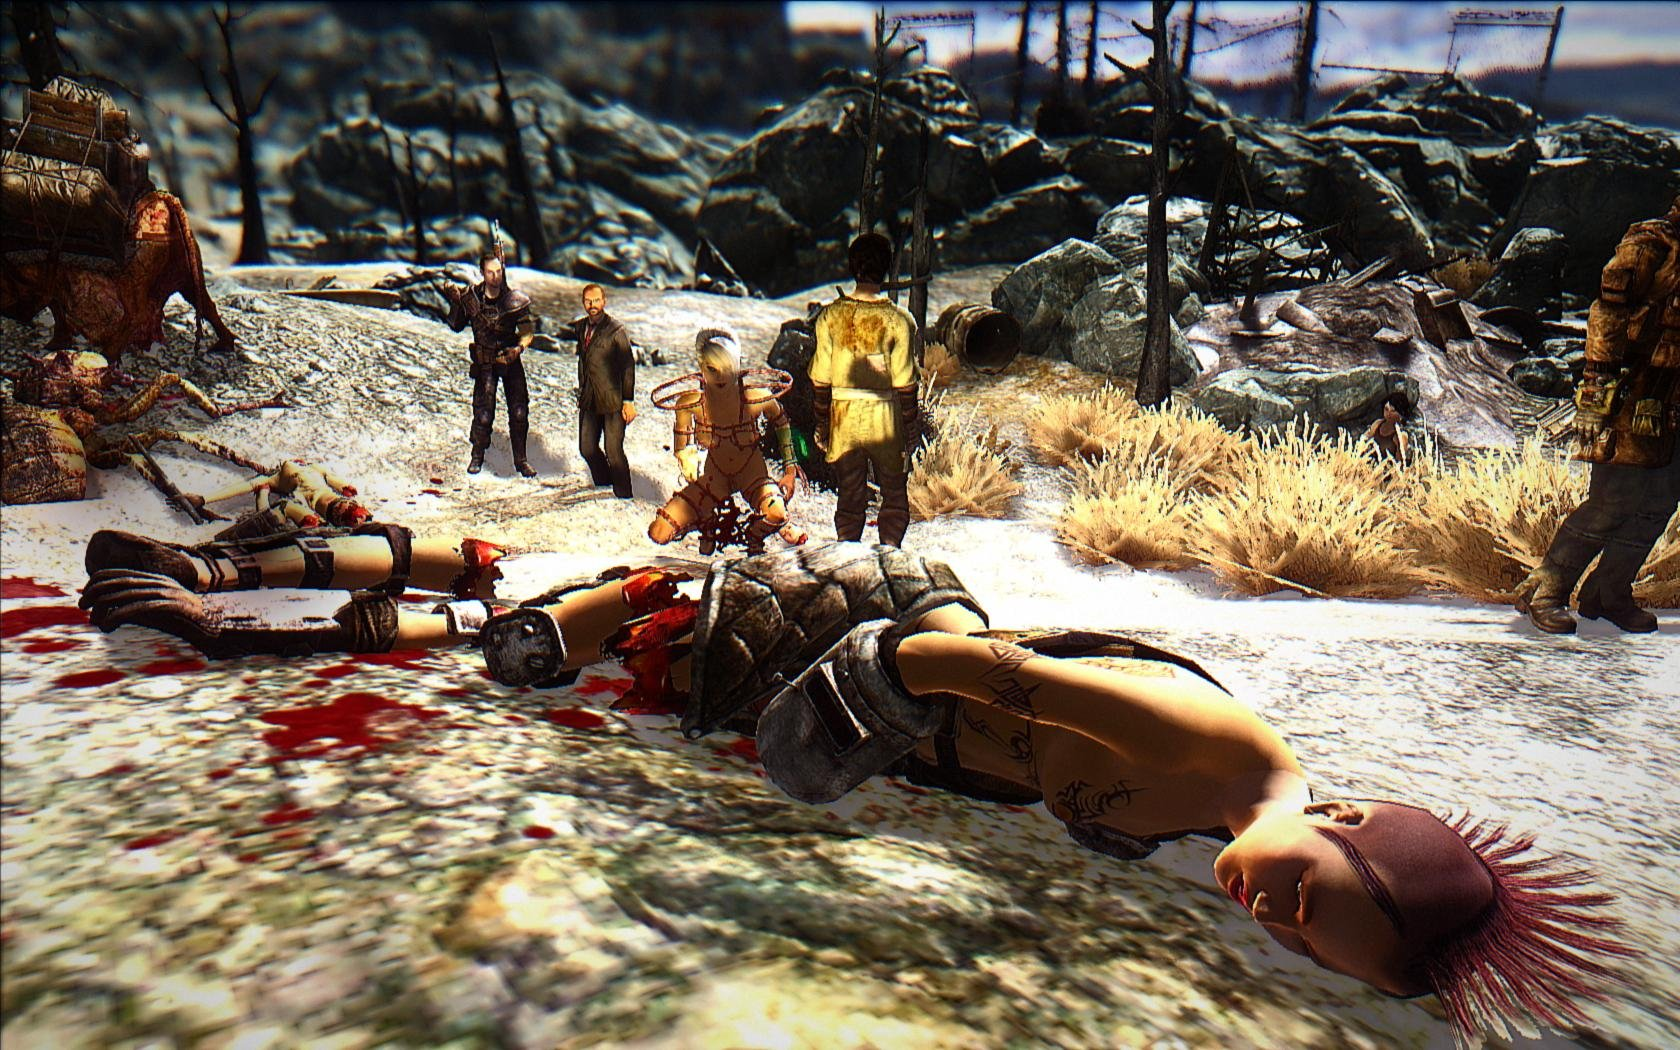 Fallout3 2018-10-19 18-22-24-83.jpg